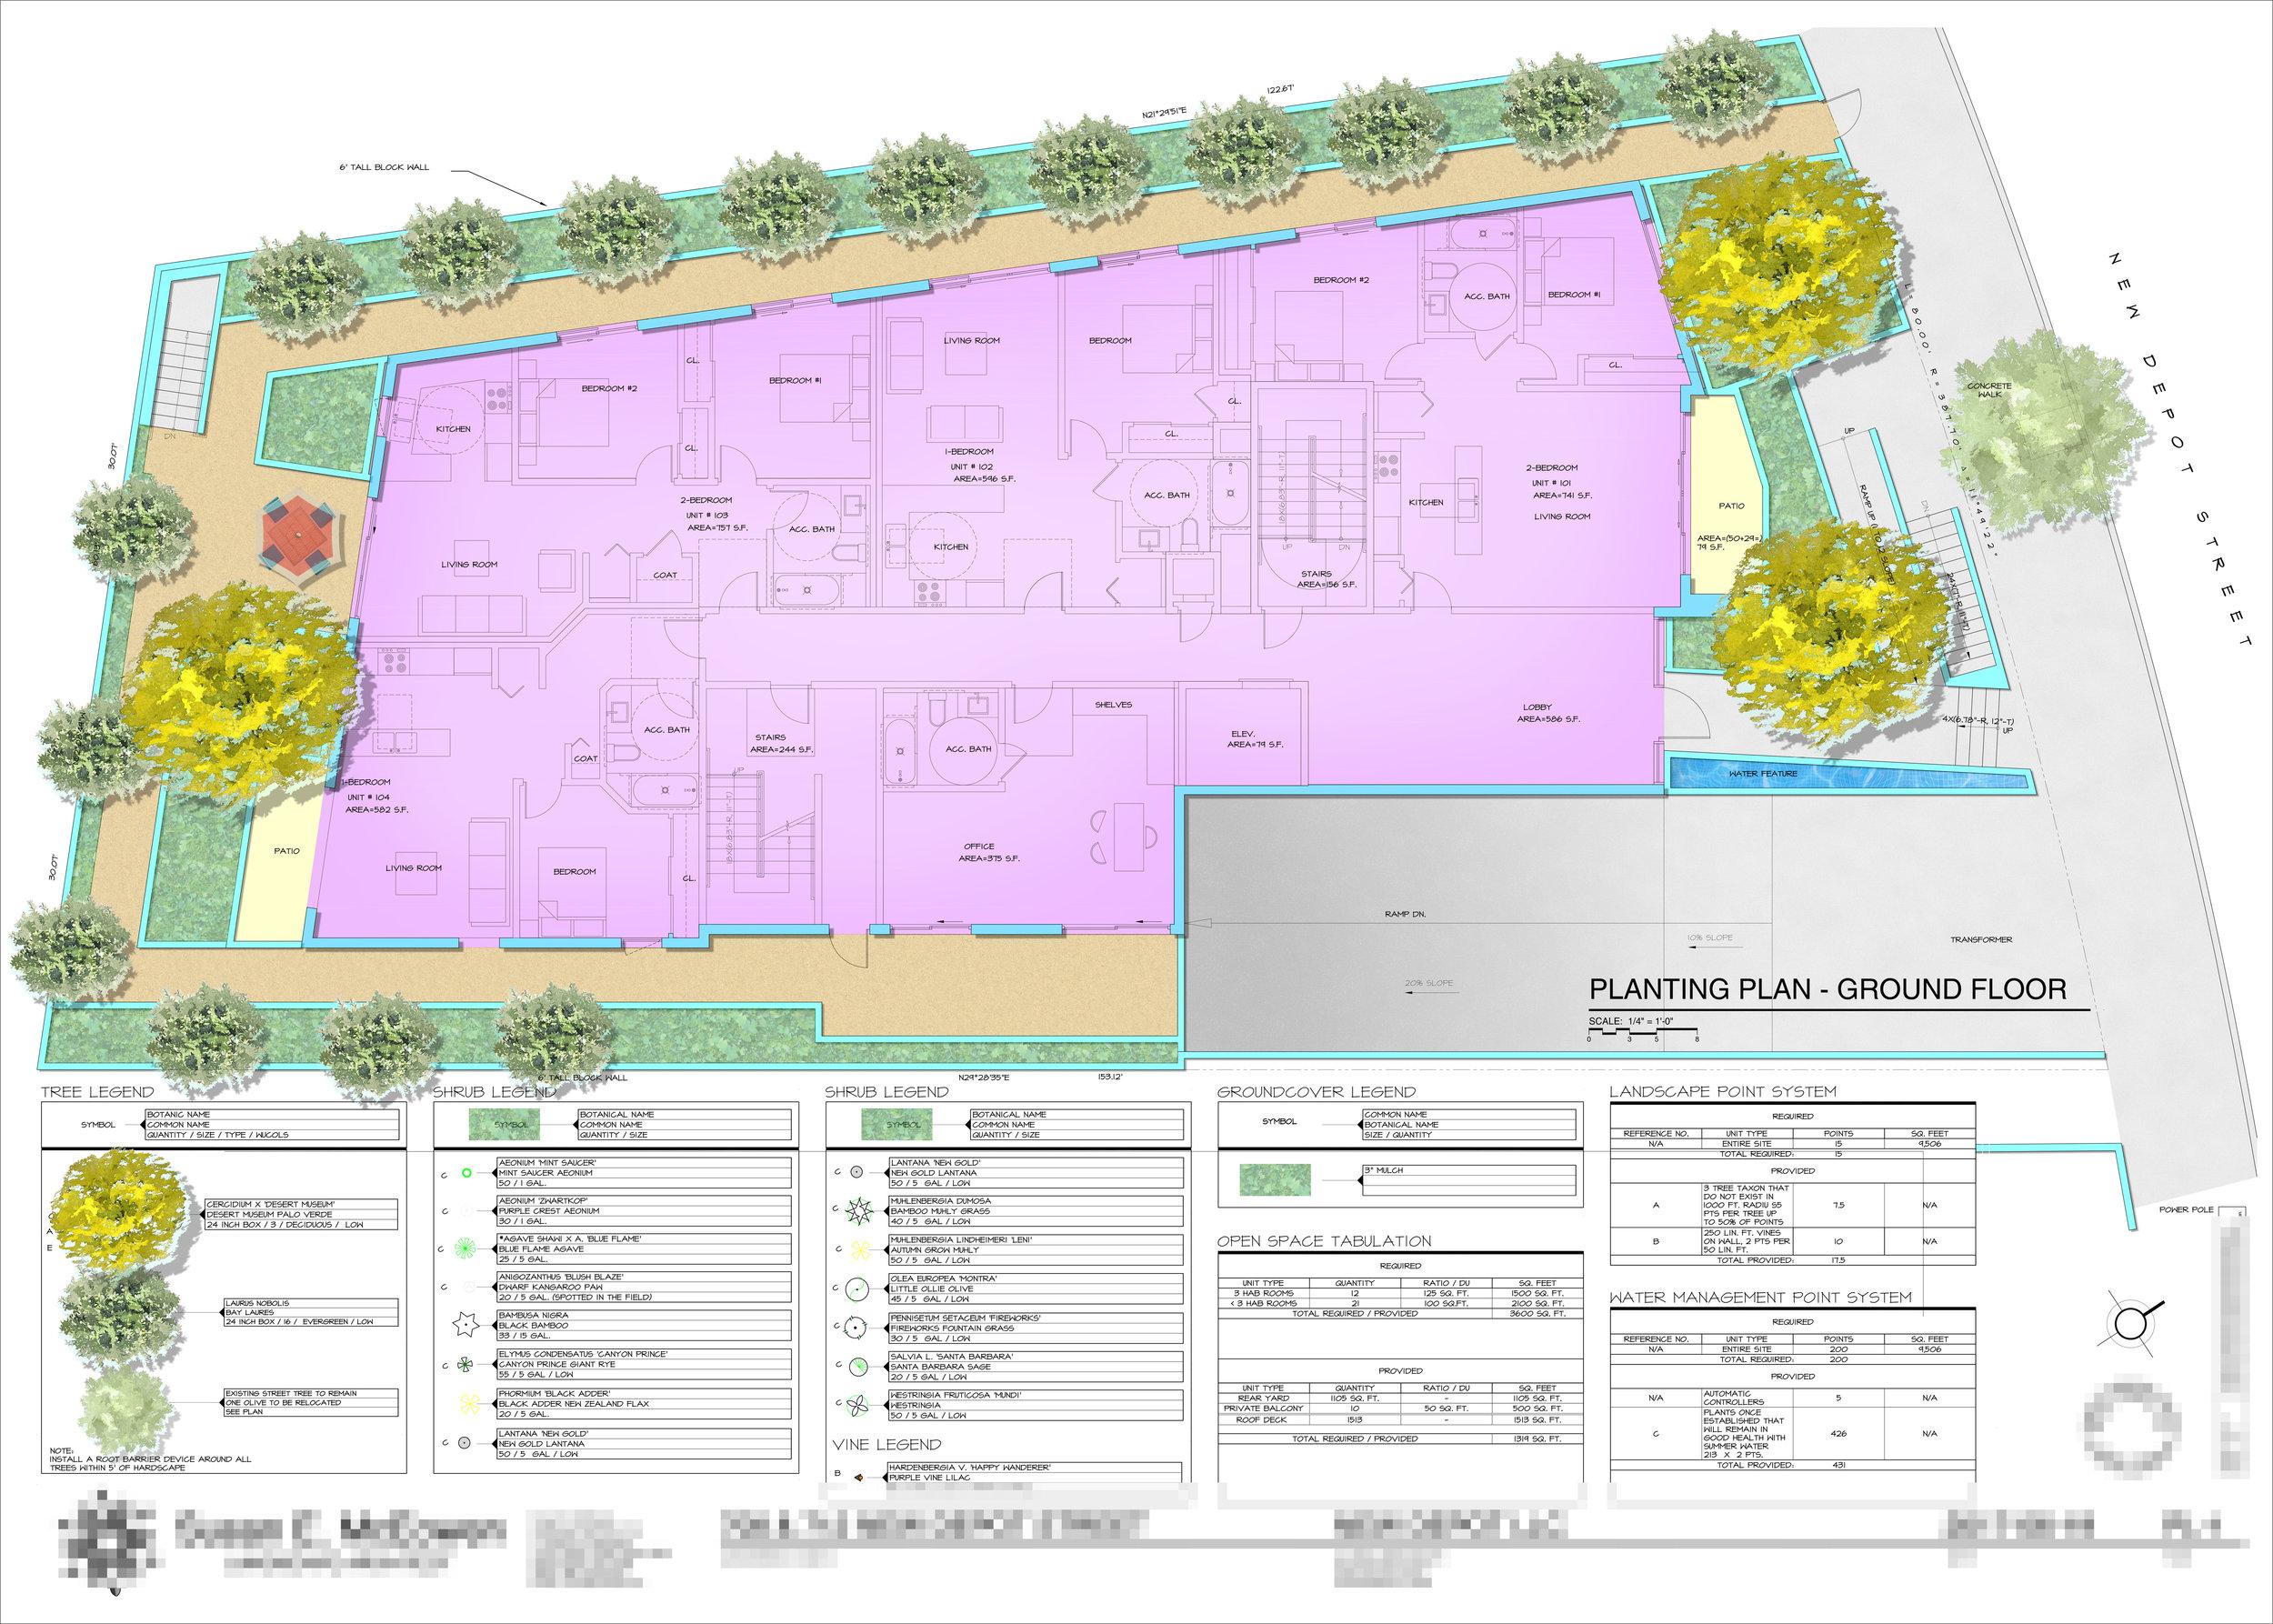 Illustration for a Preliminary Landscape Plan